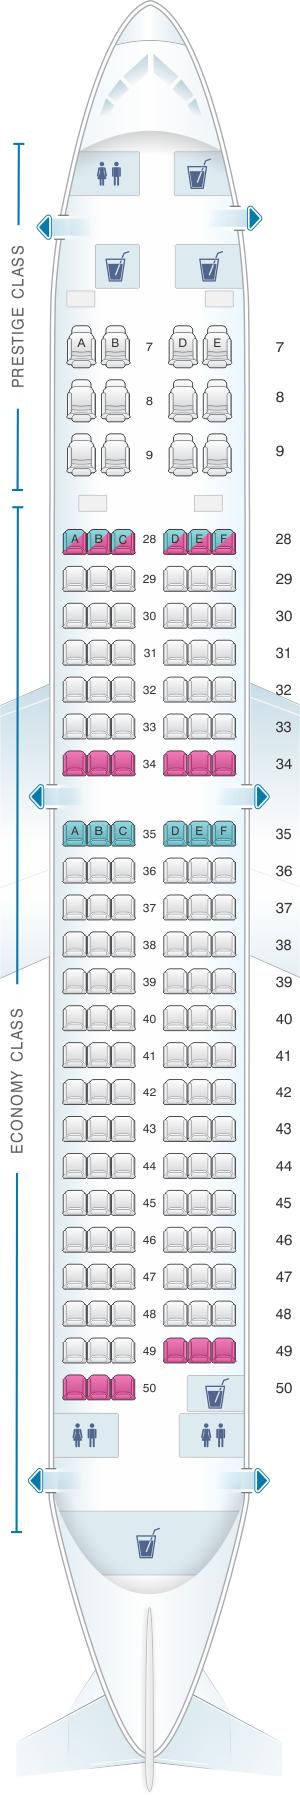 Seat map for Korean Air Boeing B737 800 147PAX